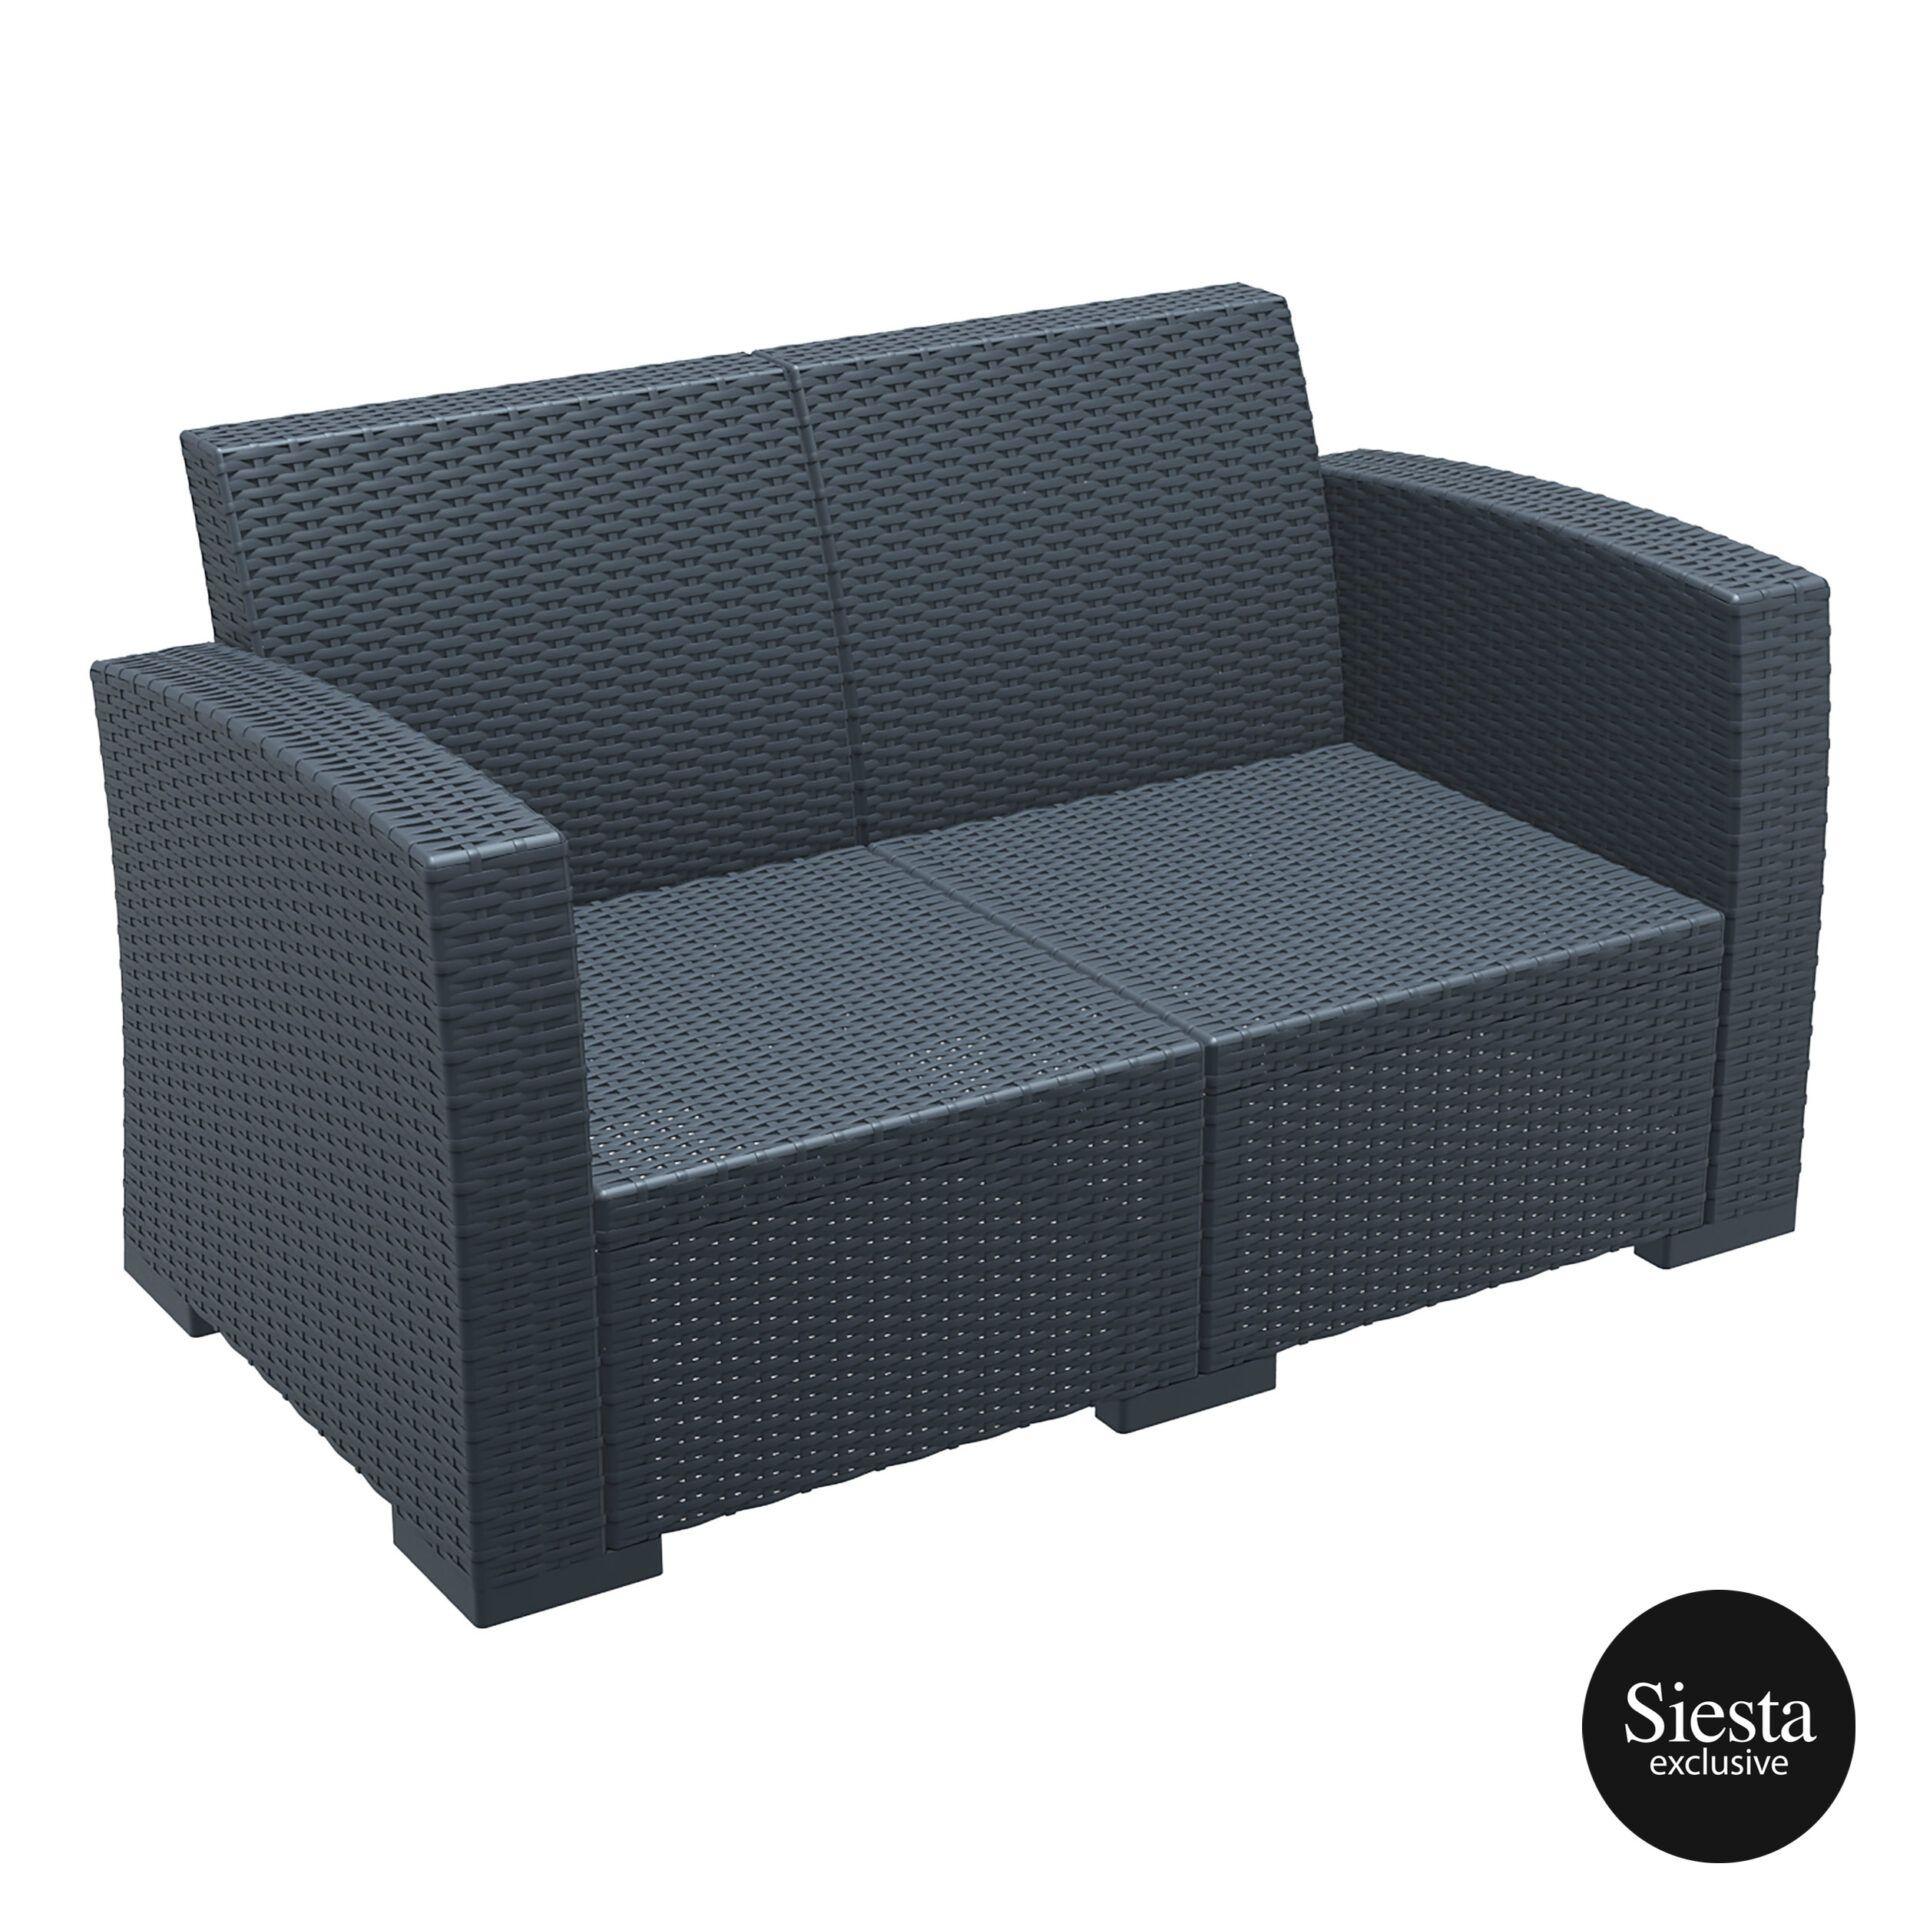 Resin Rattan Monaco Lounge Sofa darkgrey front side